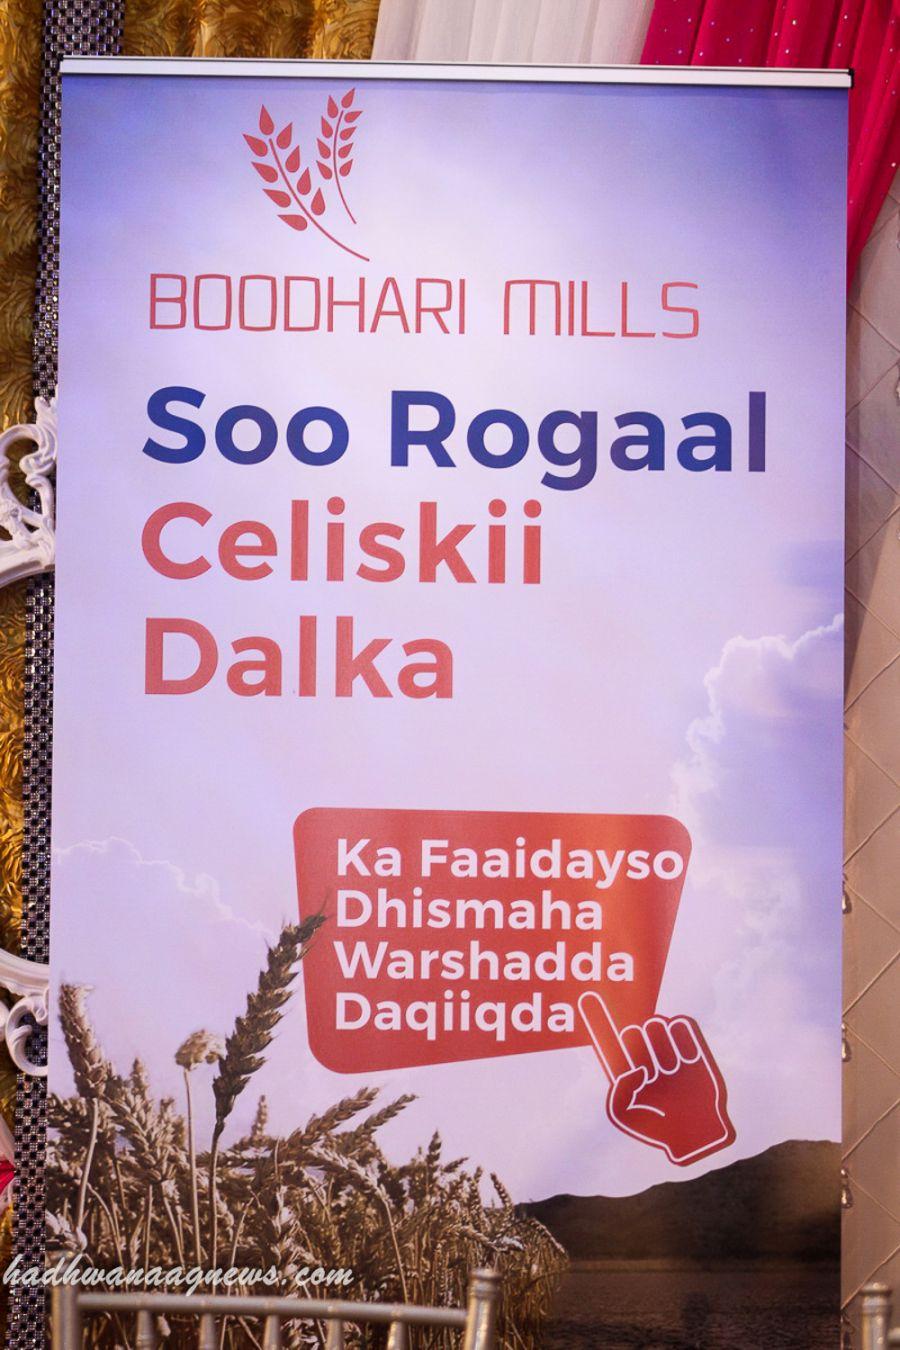 Boodharimills54